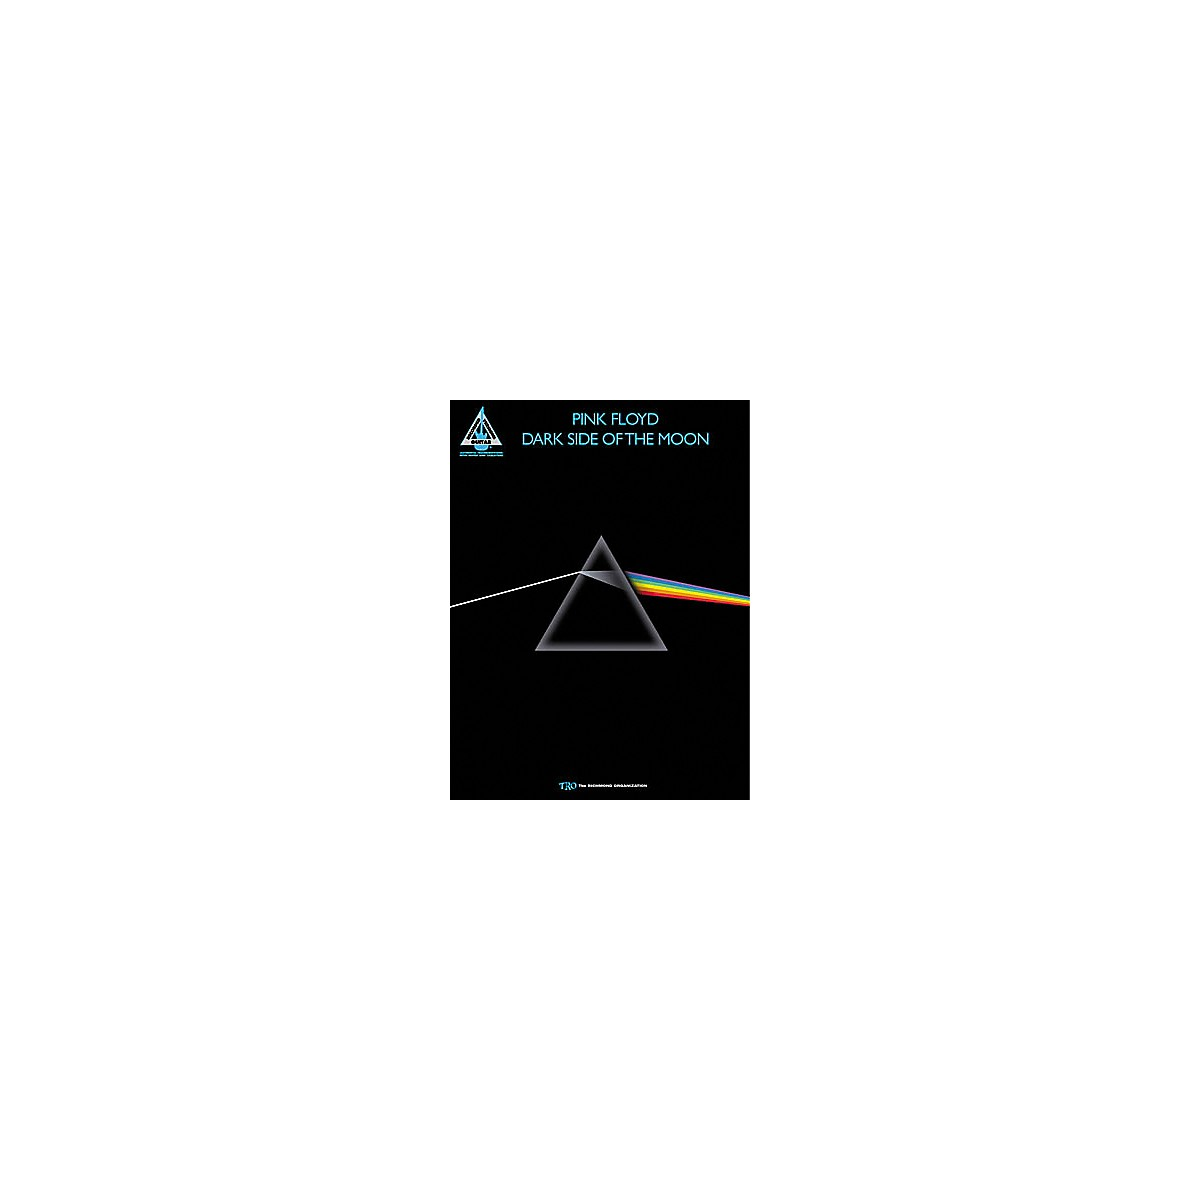 Hal Leonard Pink Floyd Dark Side of the Moon Guitar Tab Book